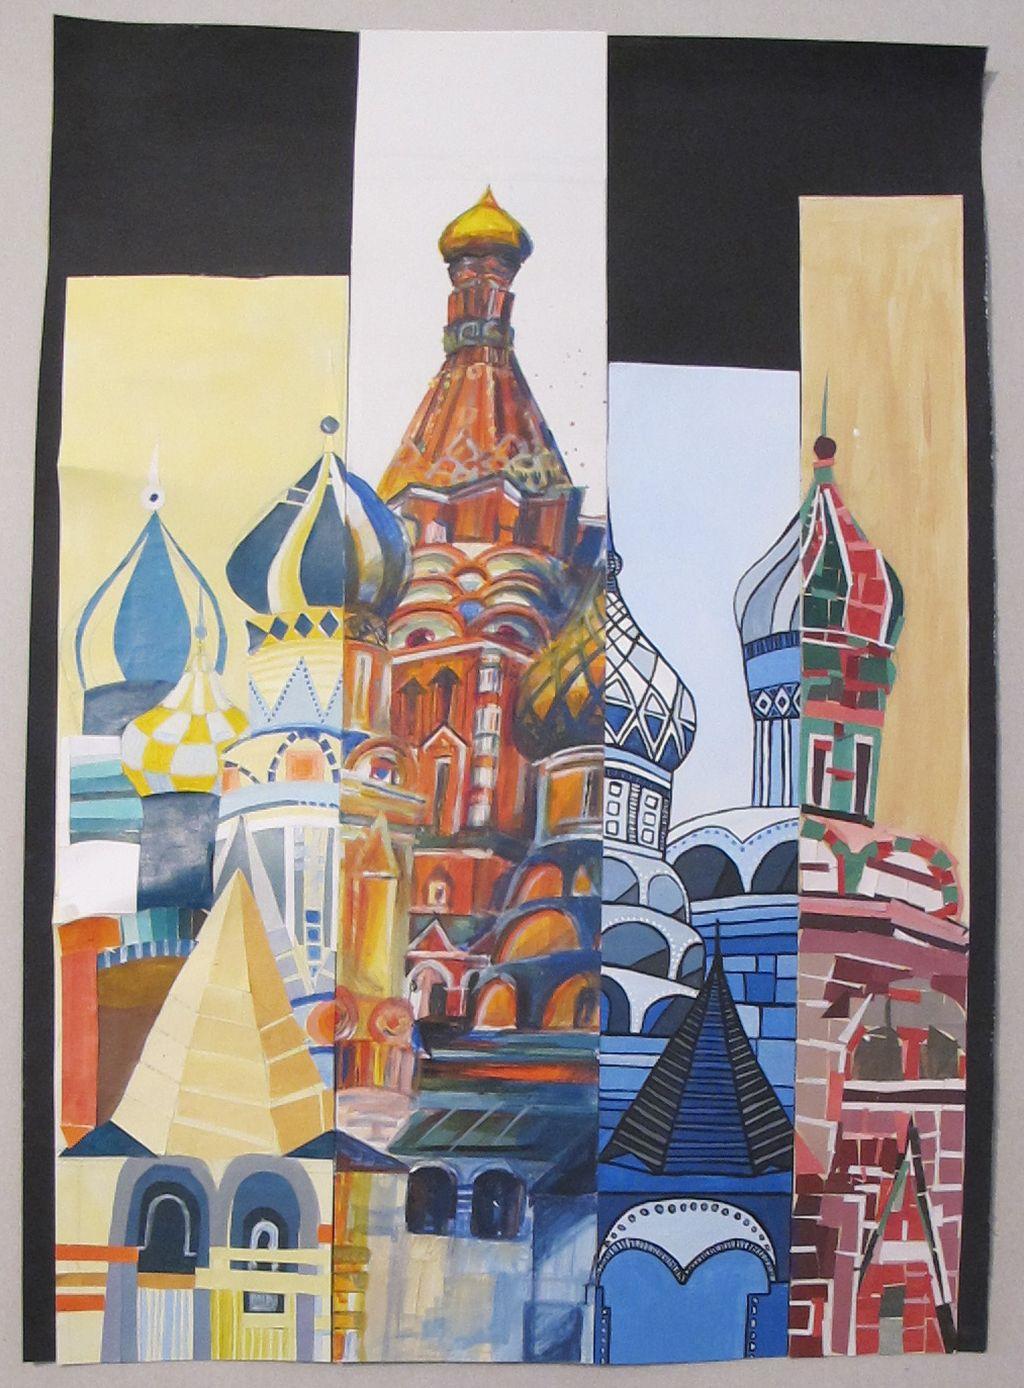 Moscova constraste cromatice lucrare de grup Stefana Chelaru, Bianca Budau, Codruta Hachman, Aida Ursu